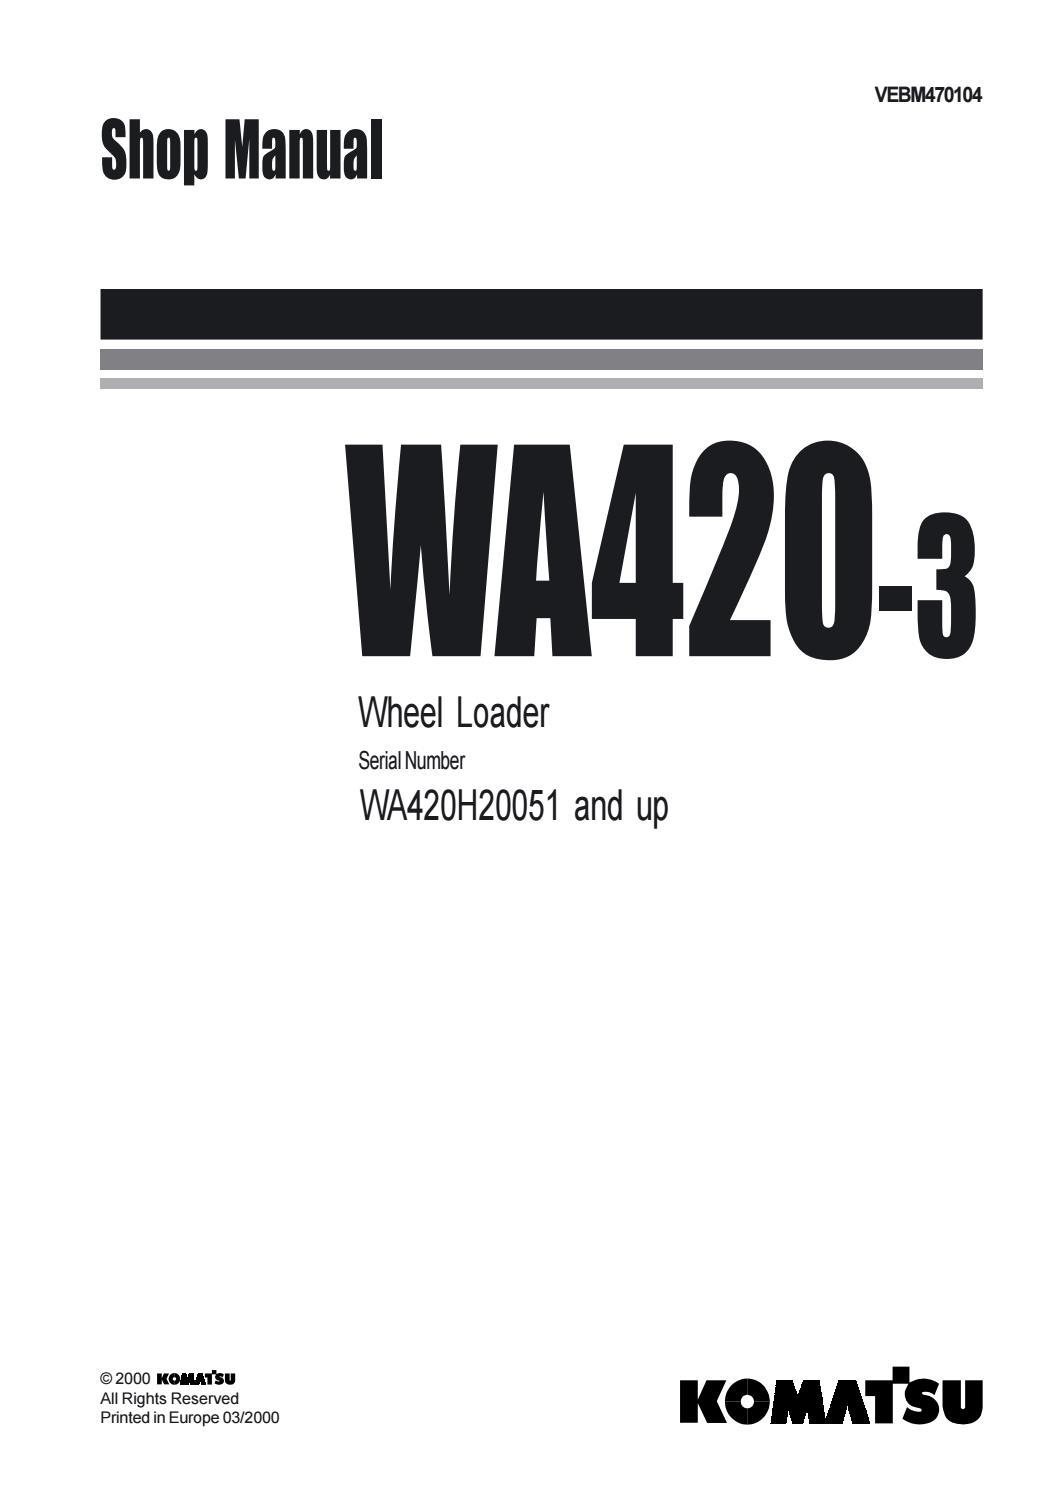 Komatsu WA420-3 Wheel Loader Service Repair Manual SNWA420H20051 and up by  16326108 - issuu